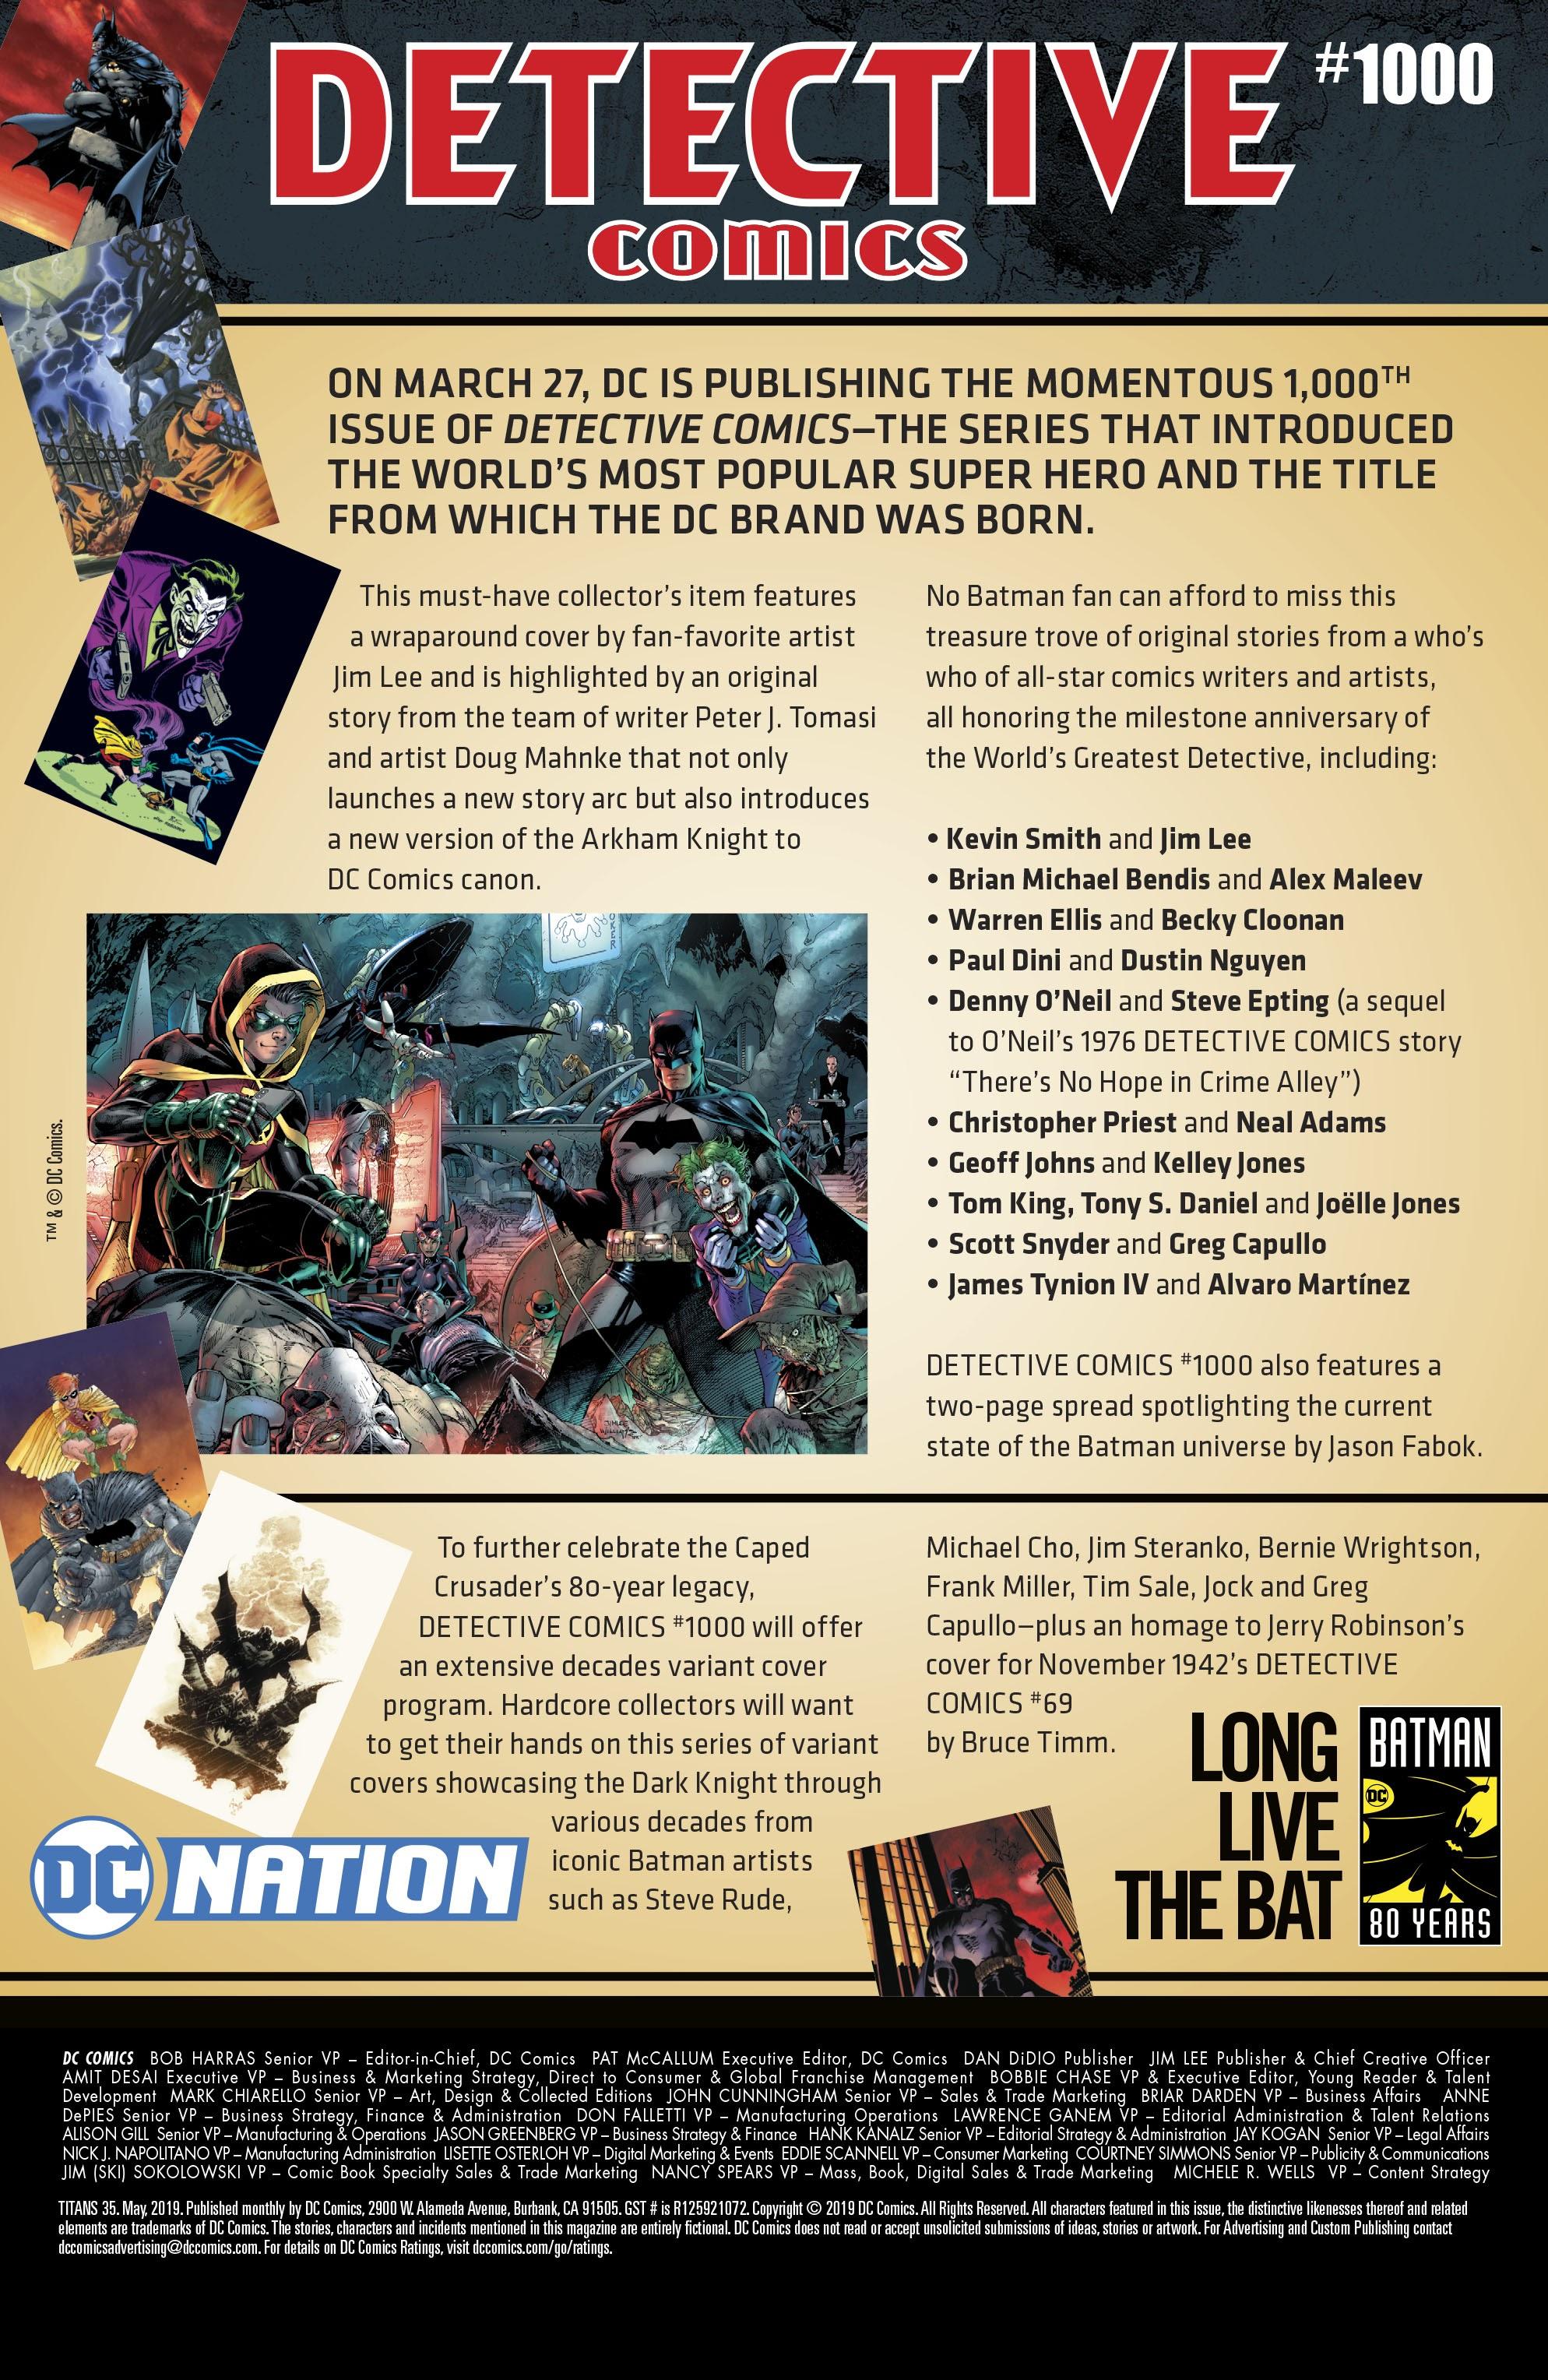 Titans (2016) Issue # 35 - ReadComic.Org